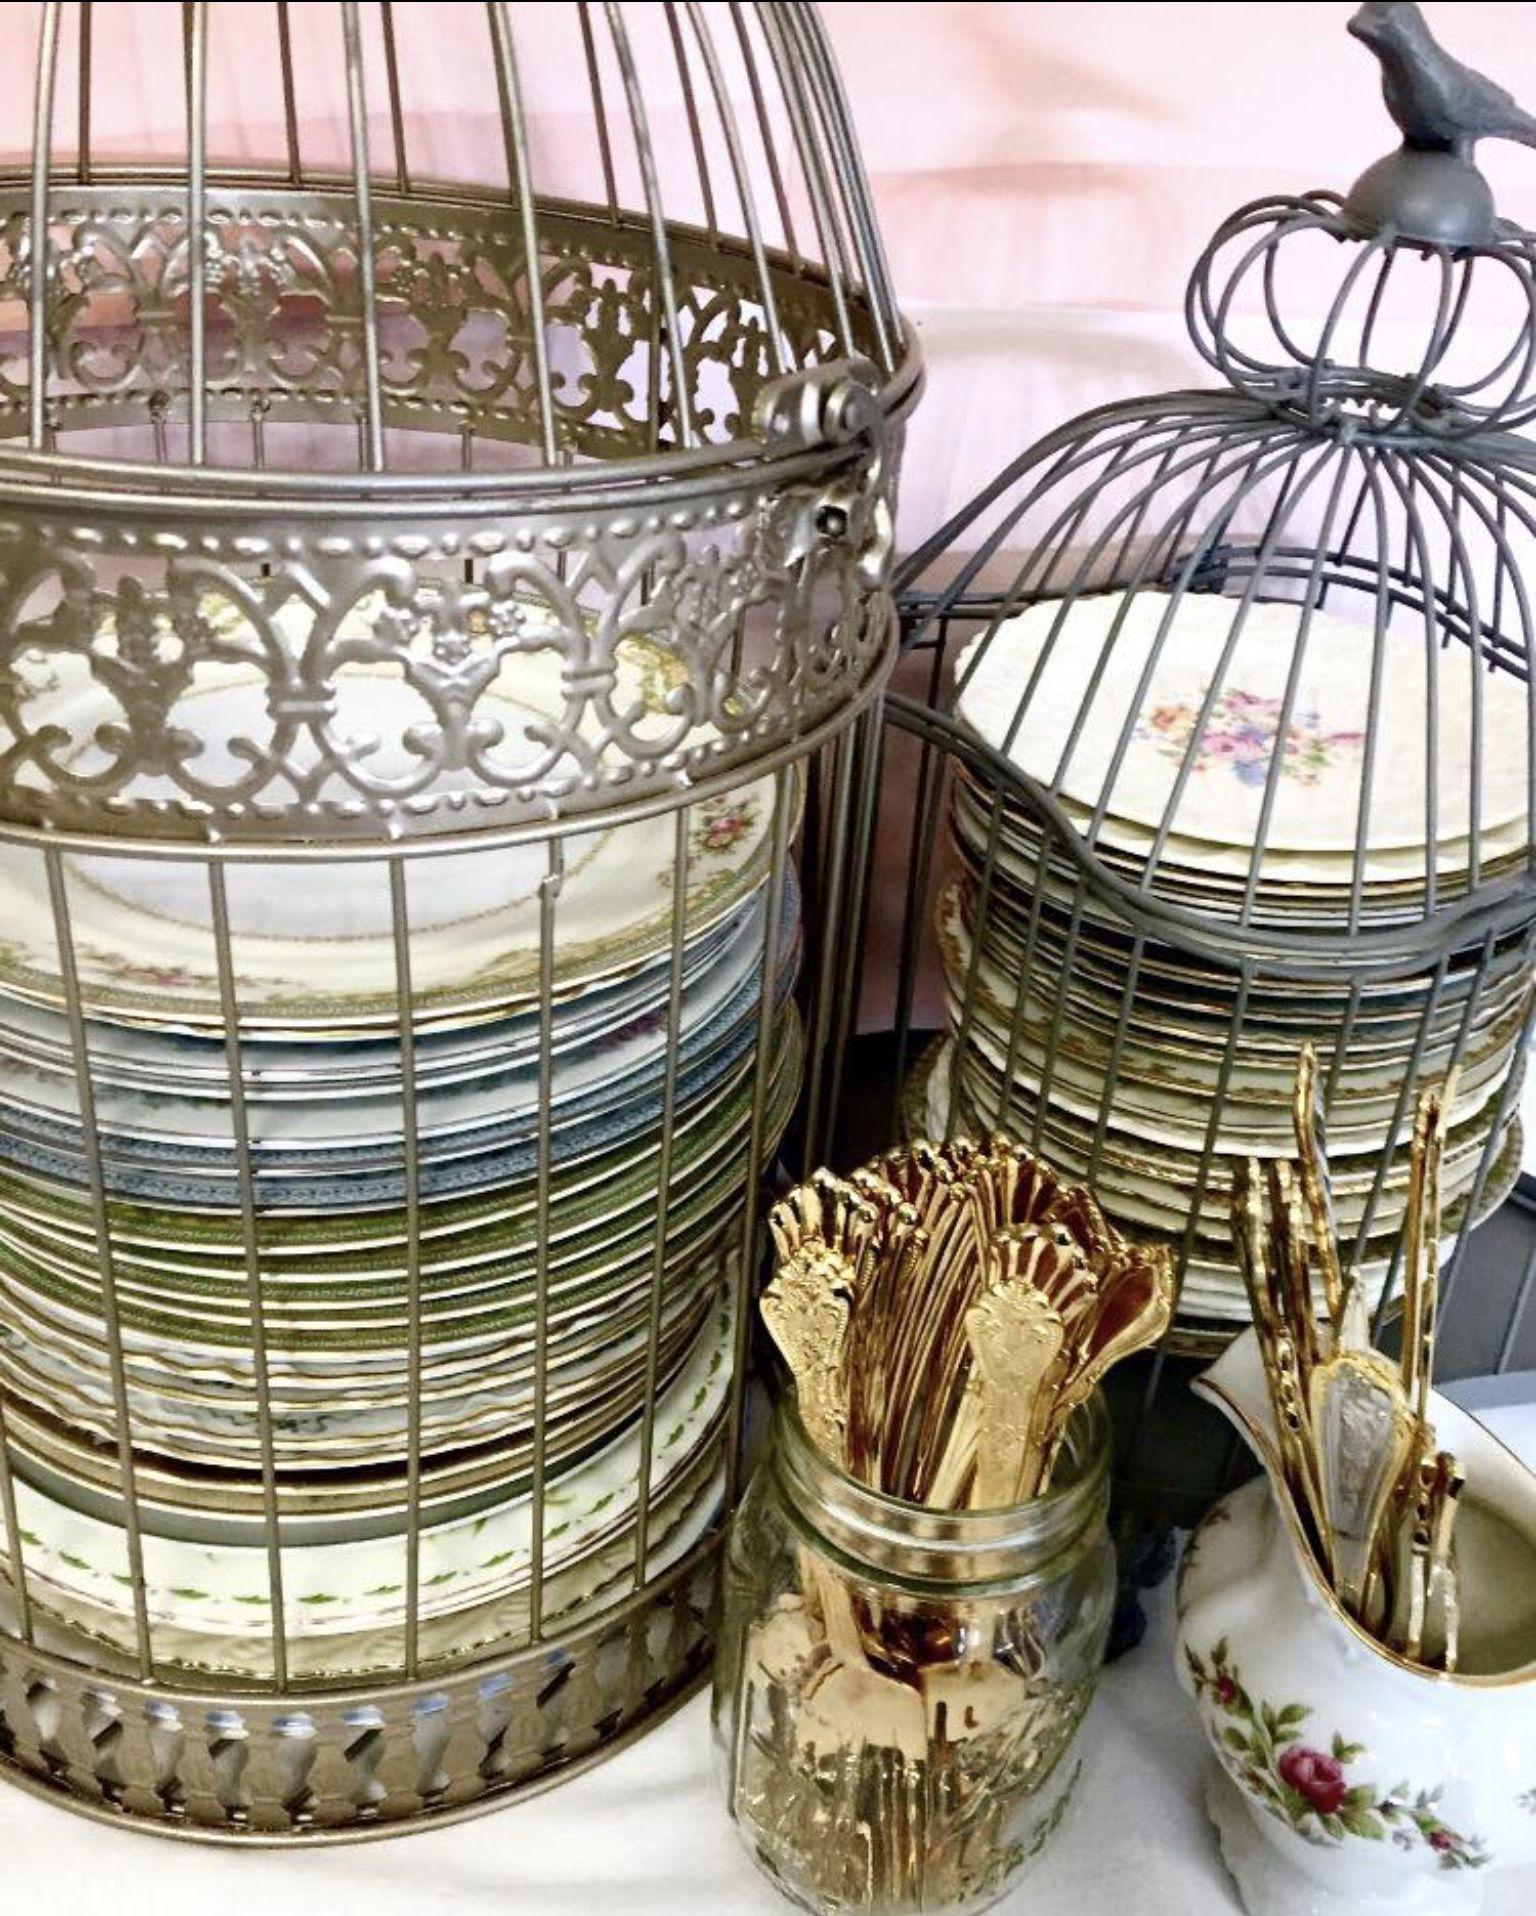 Birdcage wedding ideas wedding ideas vintage wedding